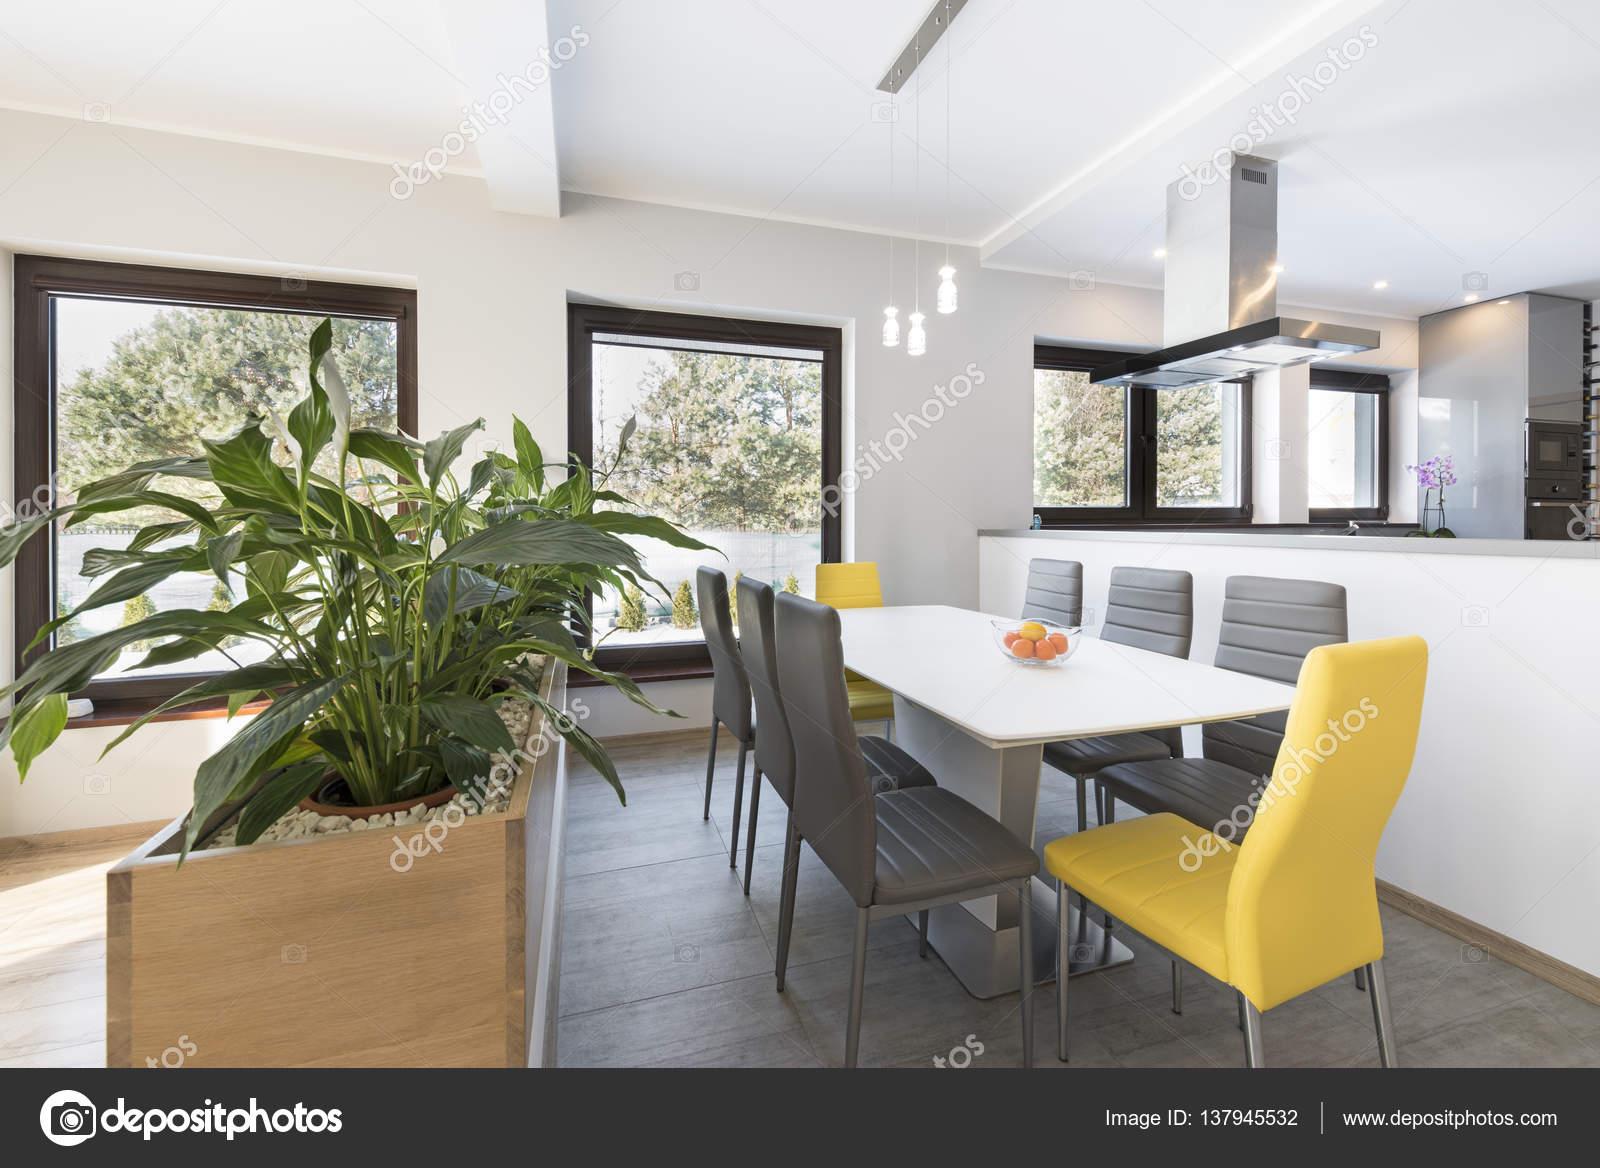 Eettafel In Woonkamer : Luxe woonkamer met eettafel u2014 stockfoto © jacek kadaj #137945532